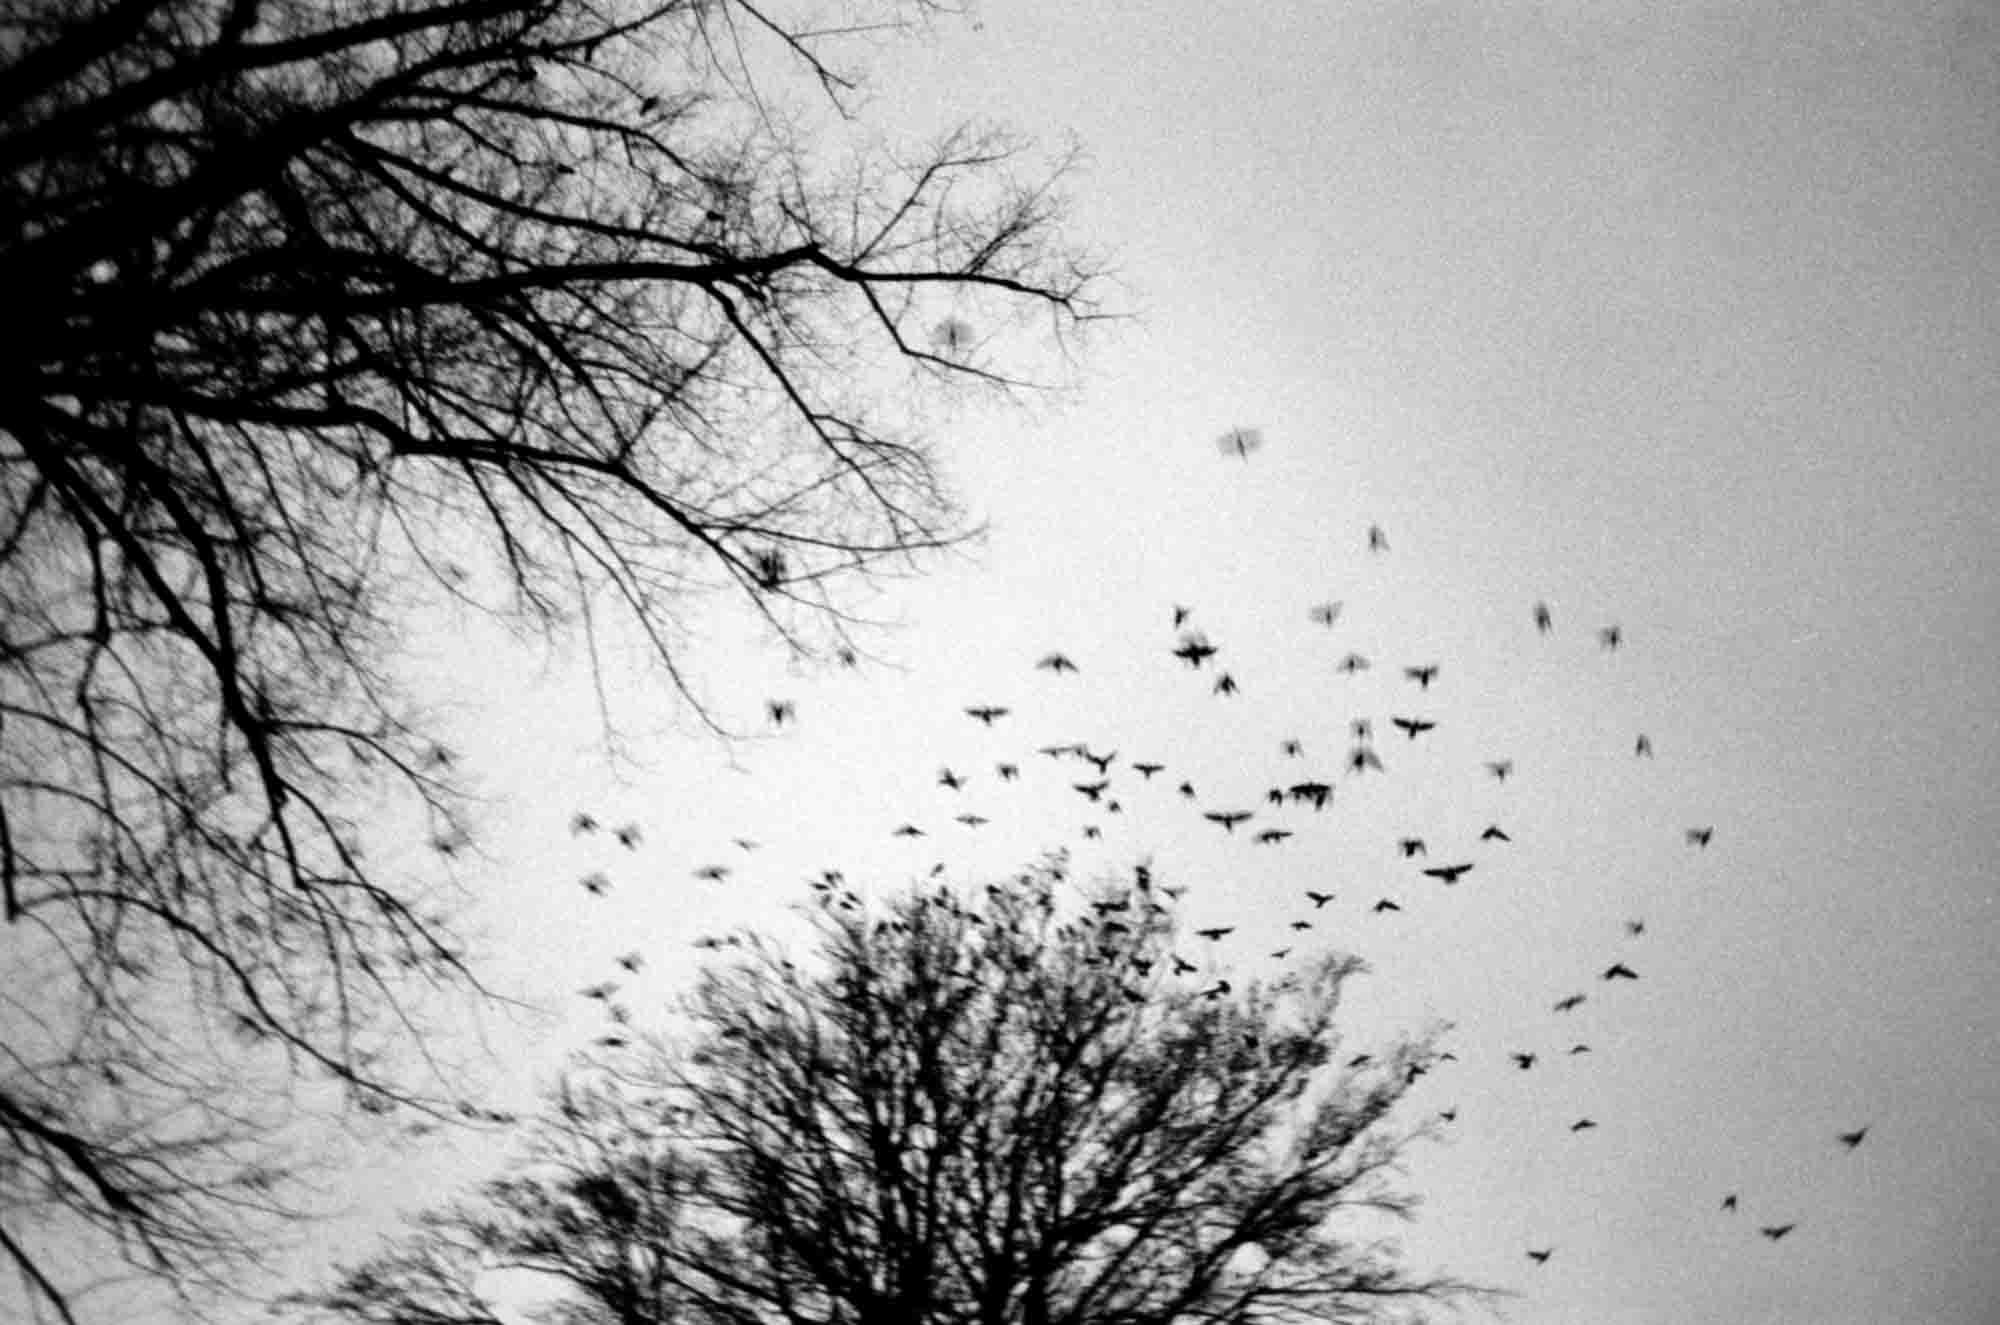 Wings. | Pentax ME Super | Kodak Tri-X EI 800